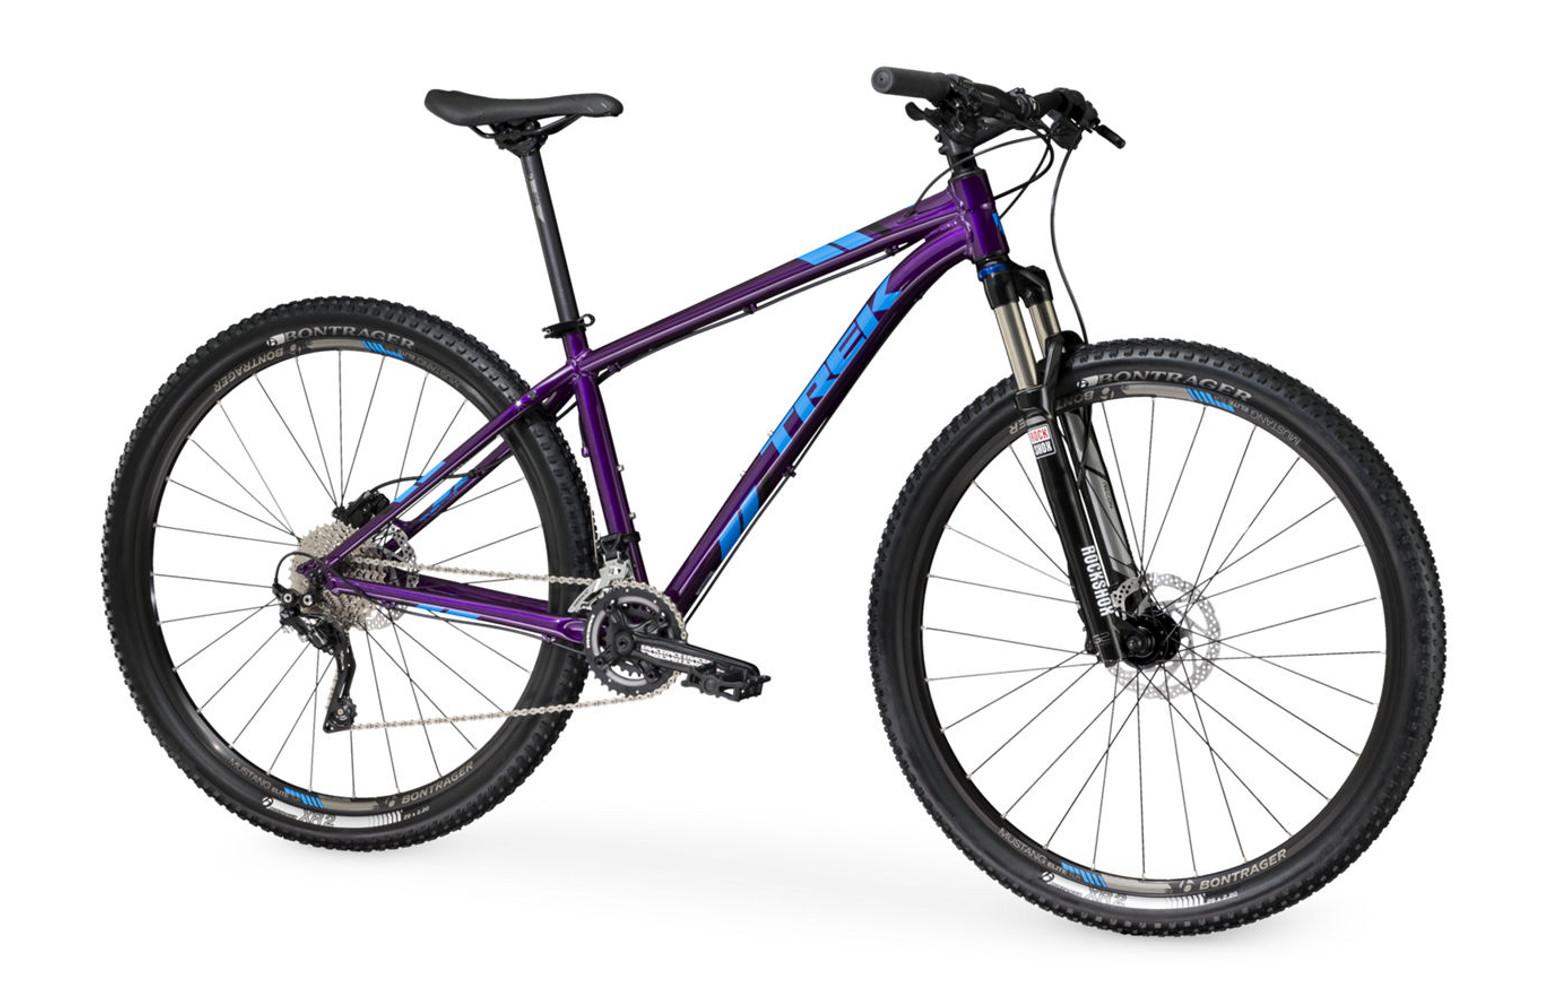 trek x caliber 9 hardtail bike purple 2016. Black Bedroom Furniture Sets. Home Design Ideas